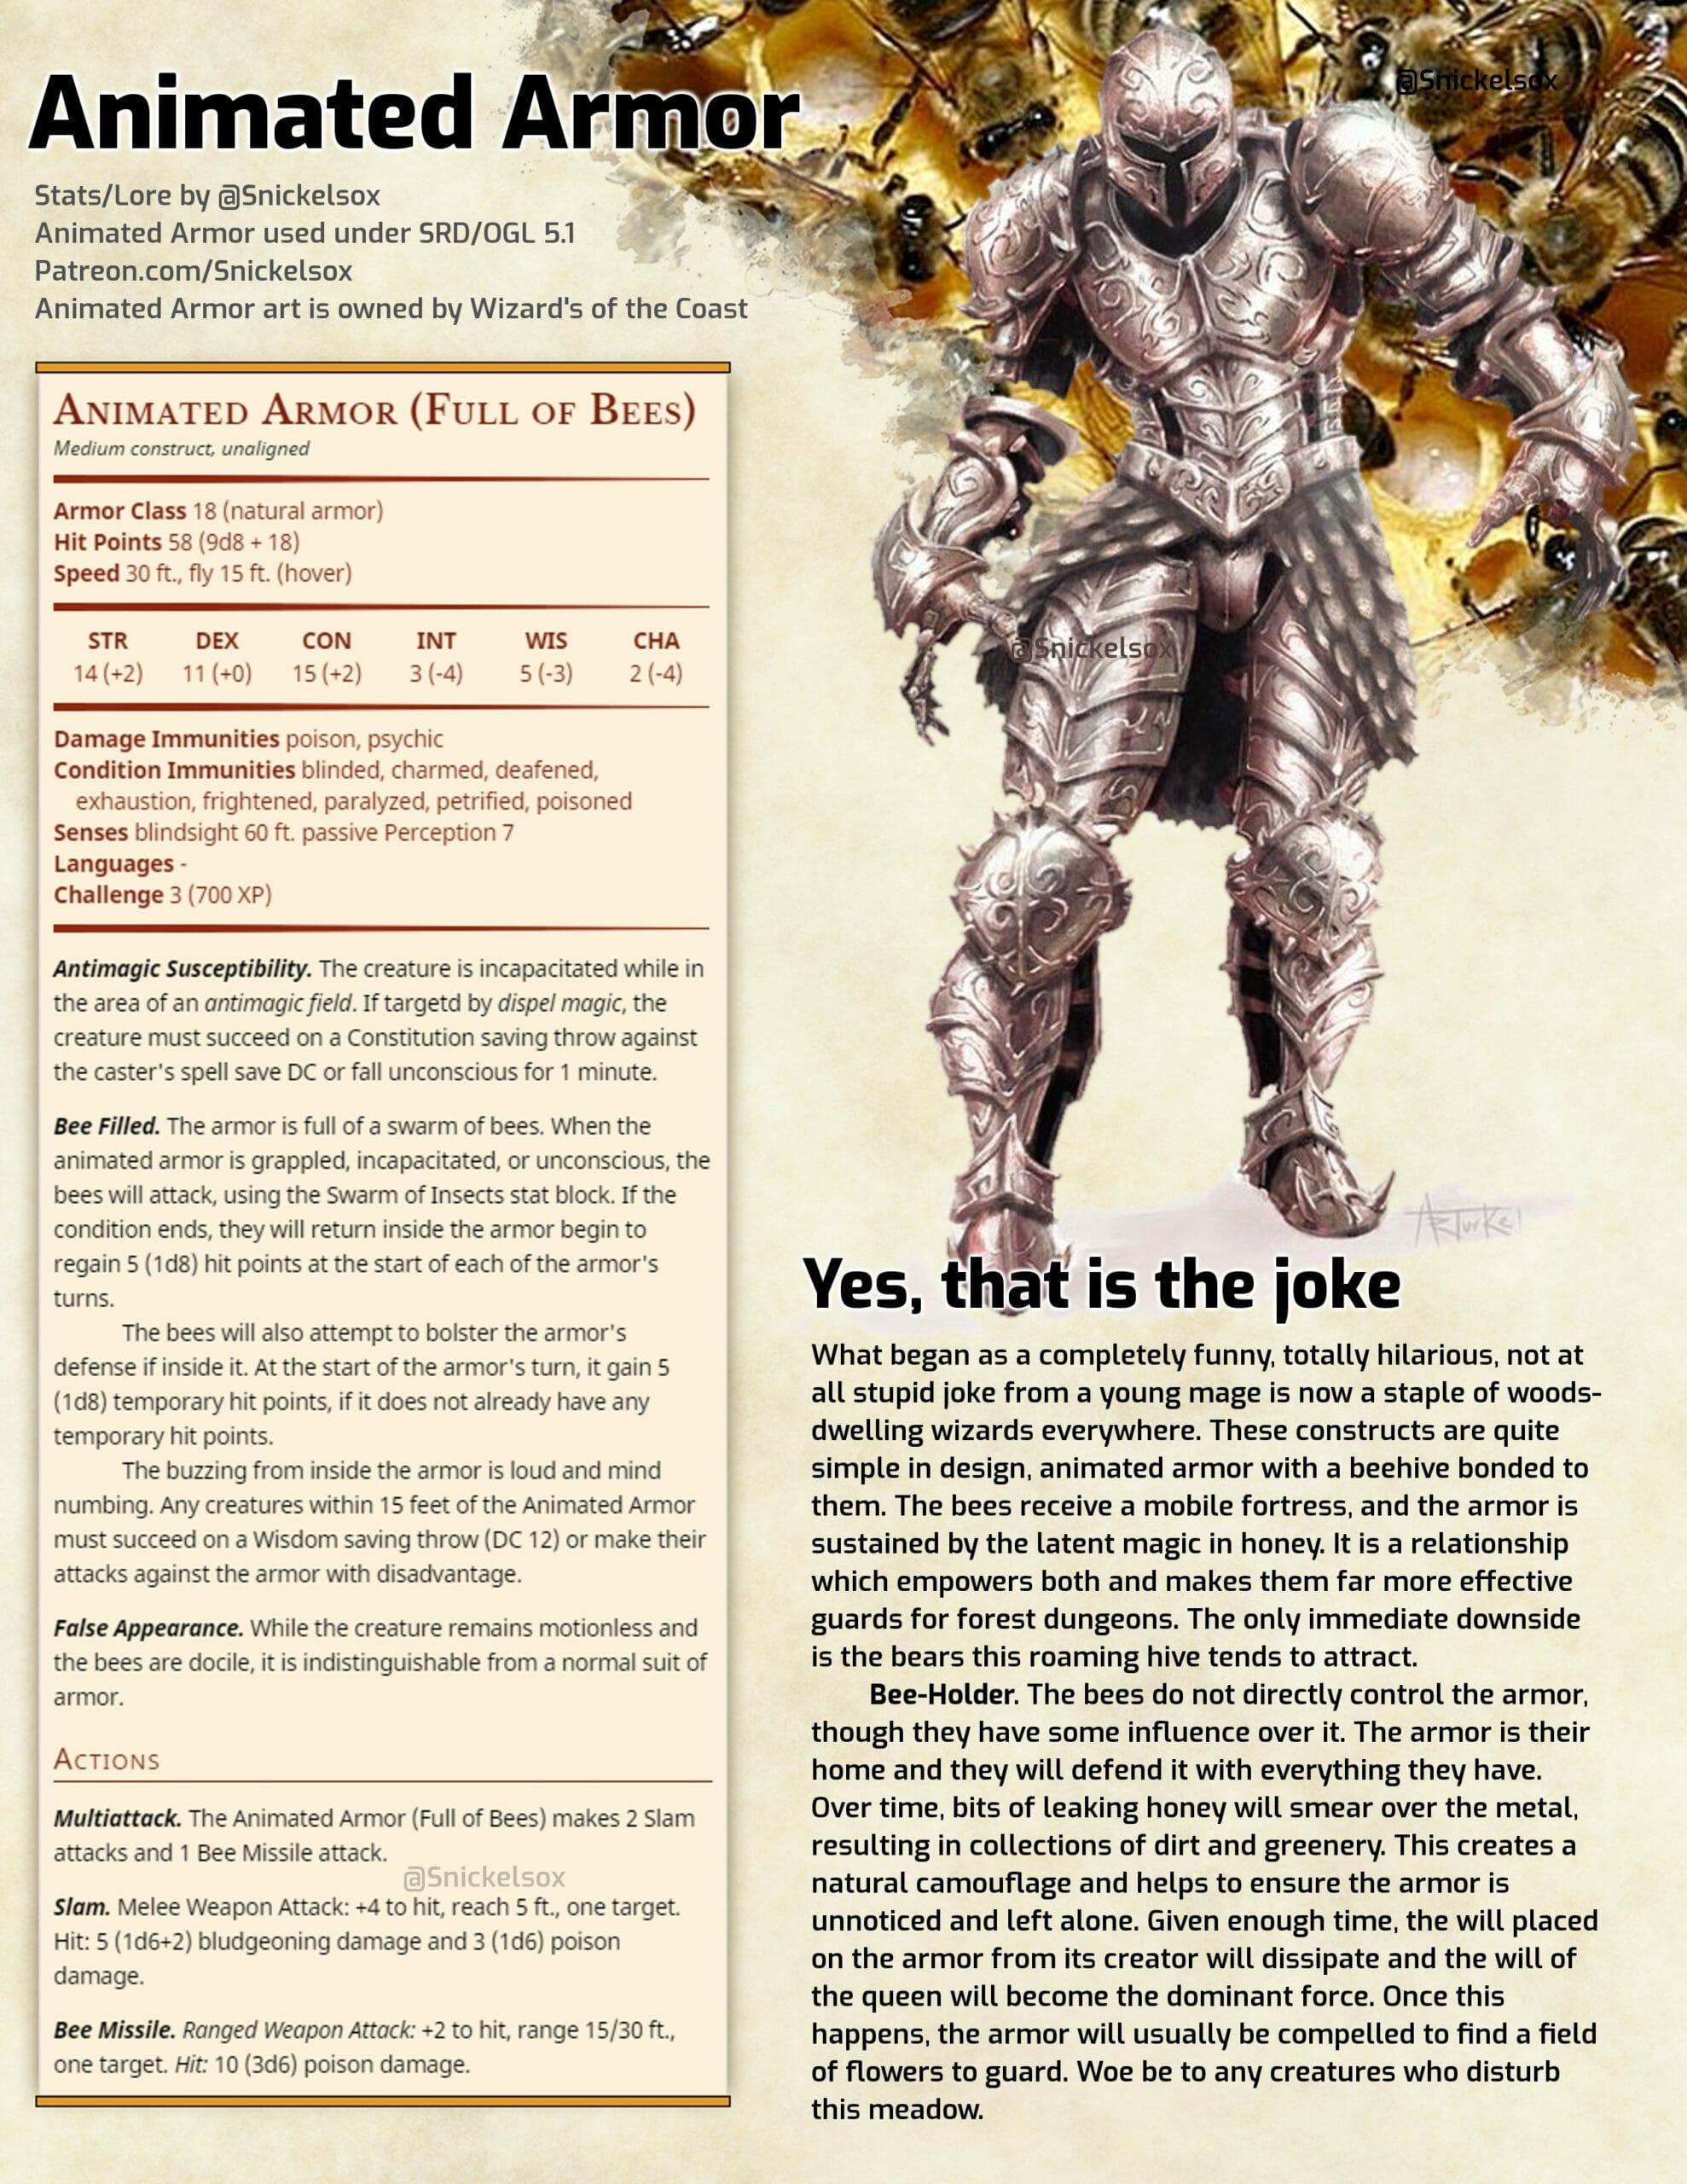 Animated bee armour